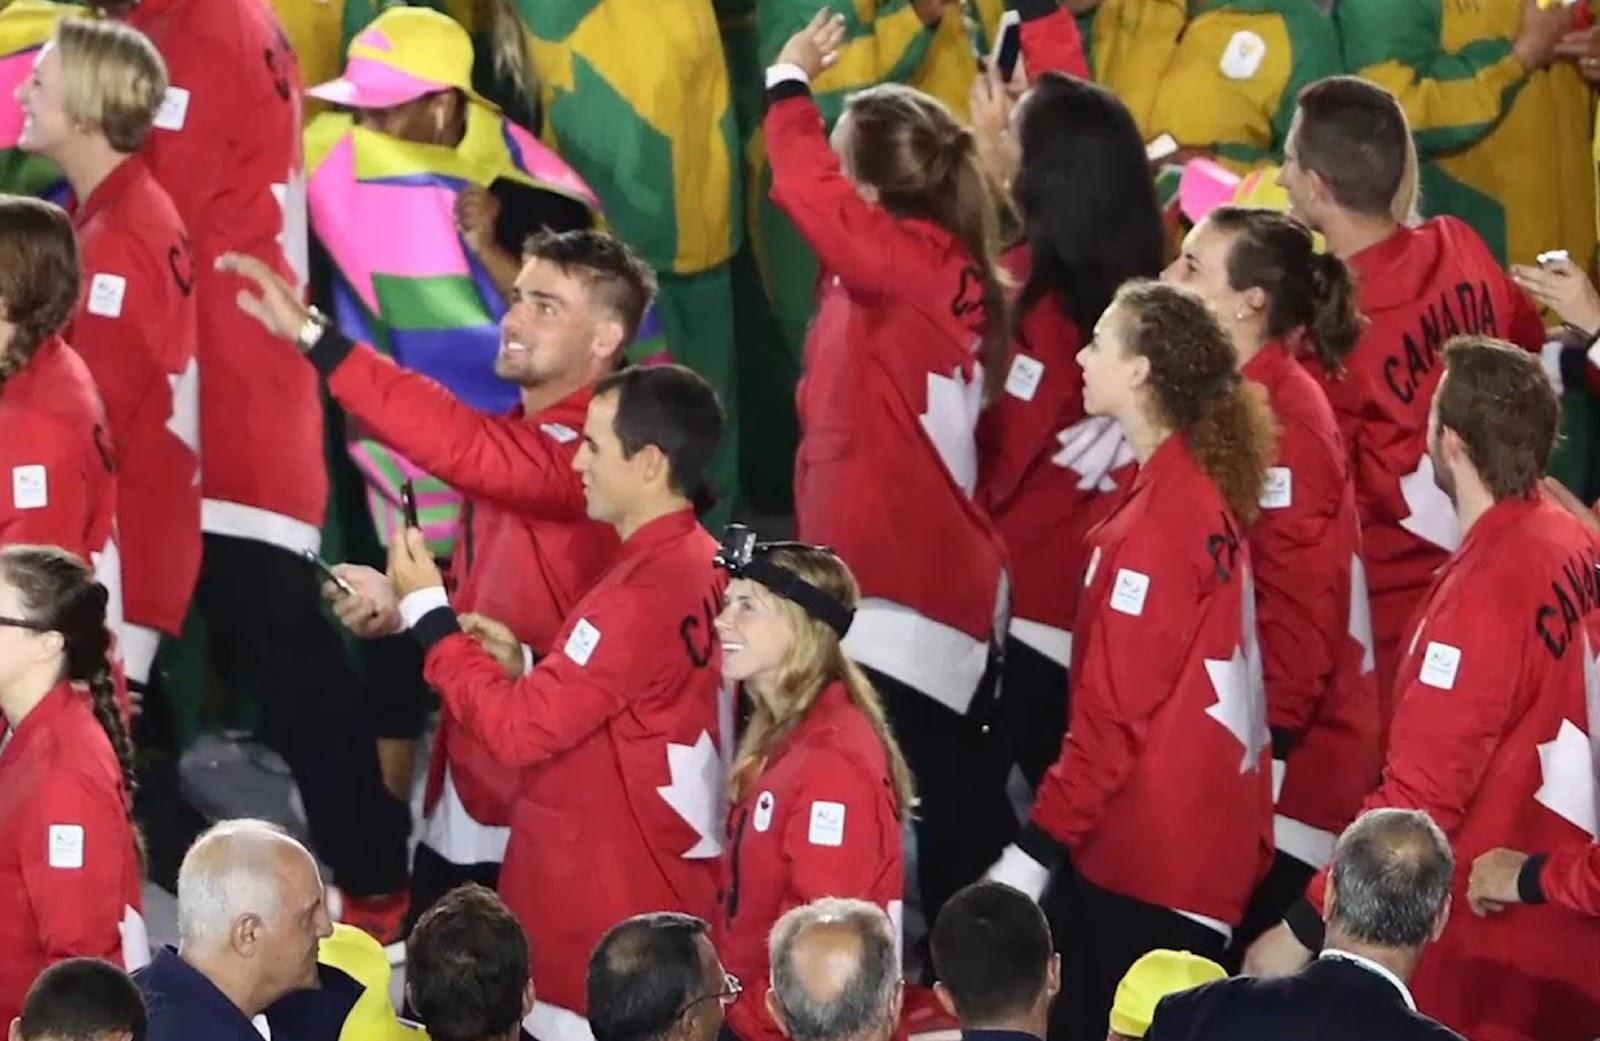 RIO OLYMPICS OPENING CEREMONY 22